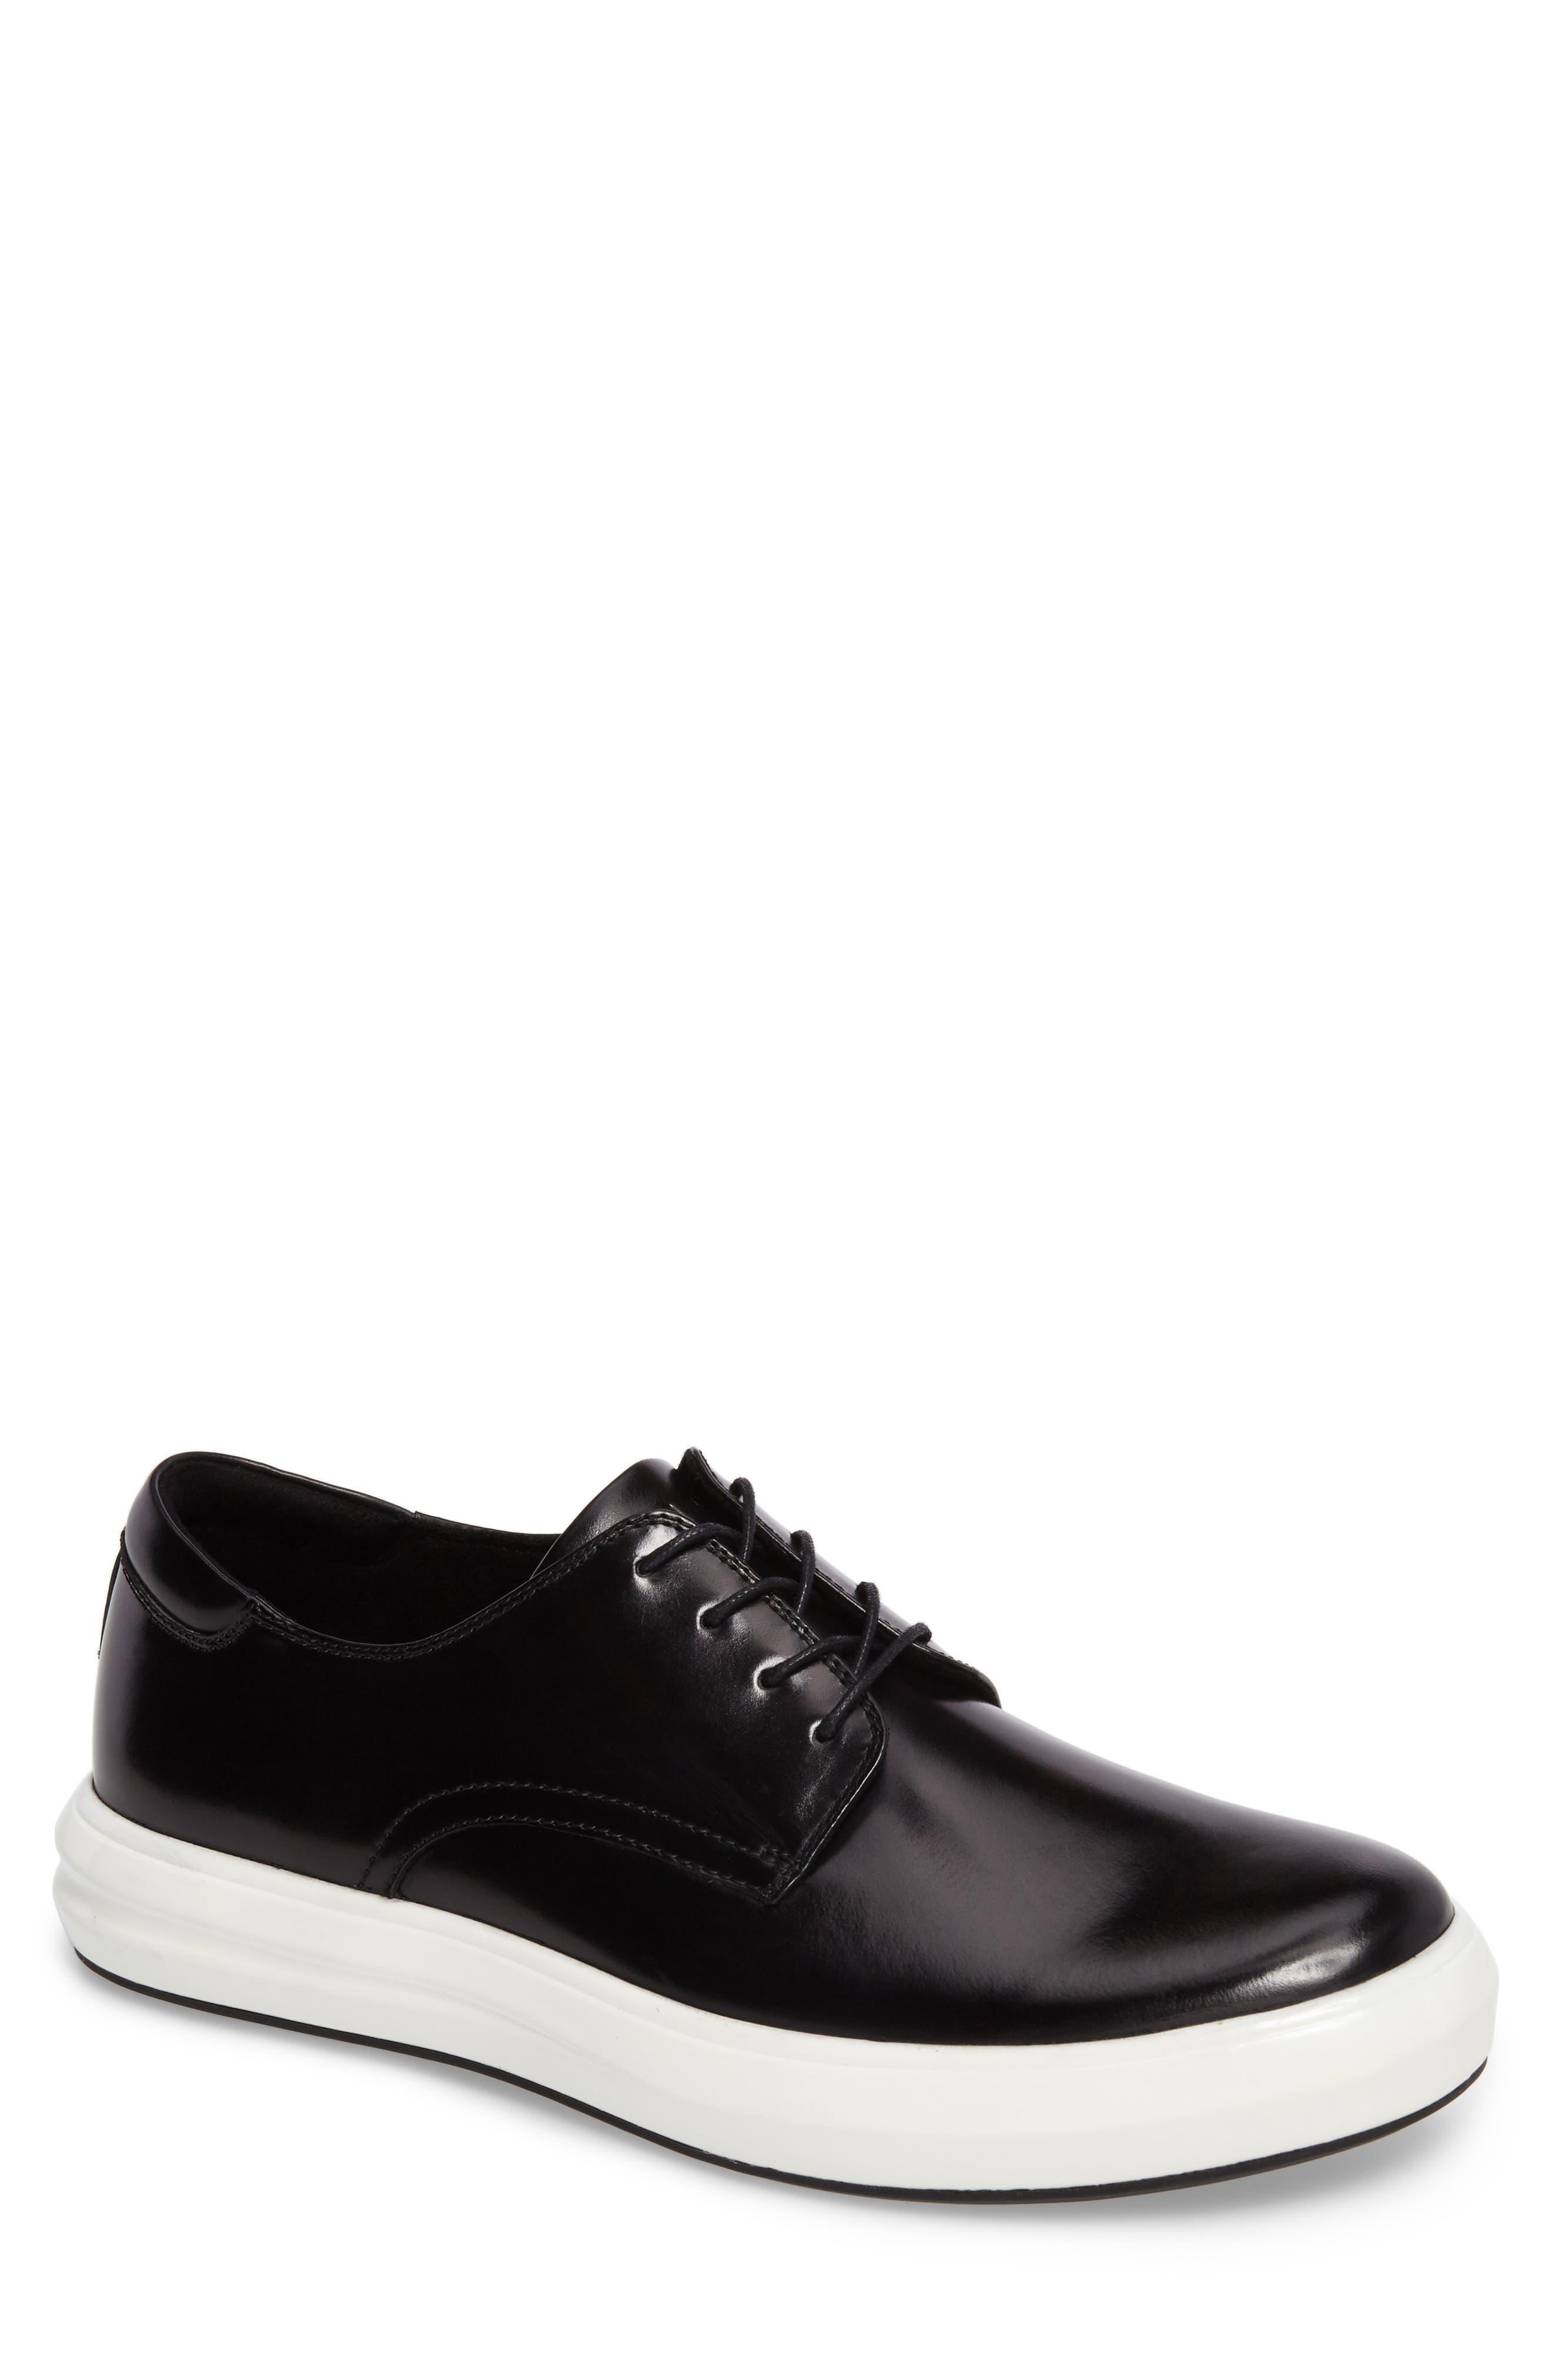 Alternate Image 1 Selected - Kenneth Cole New York Sneaker (Men)